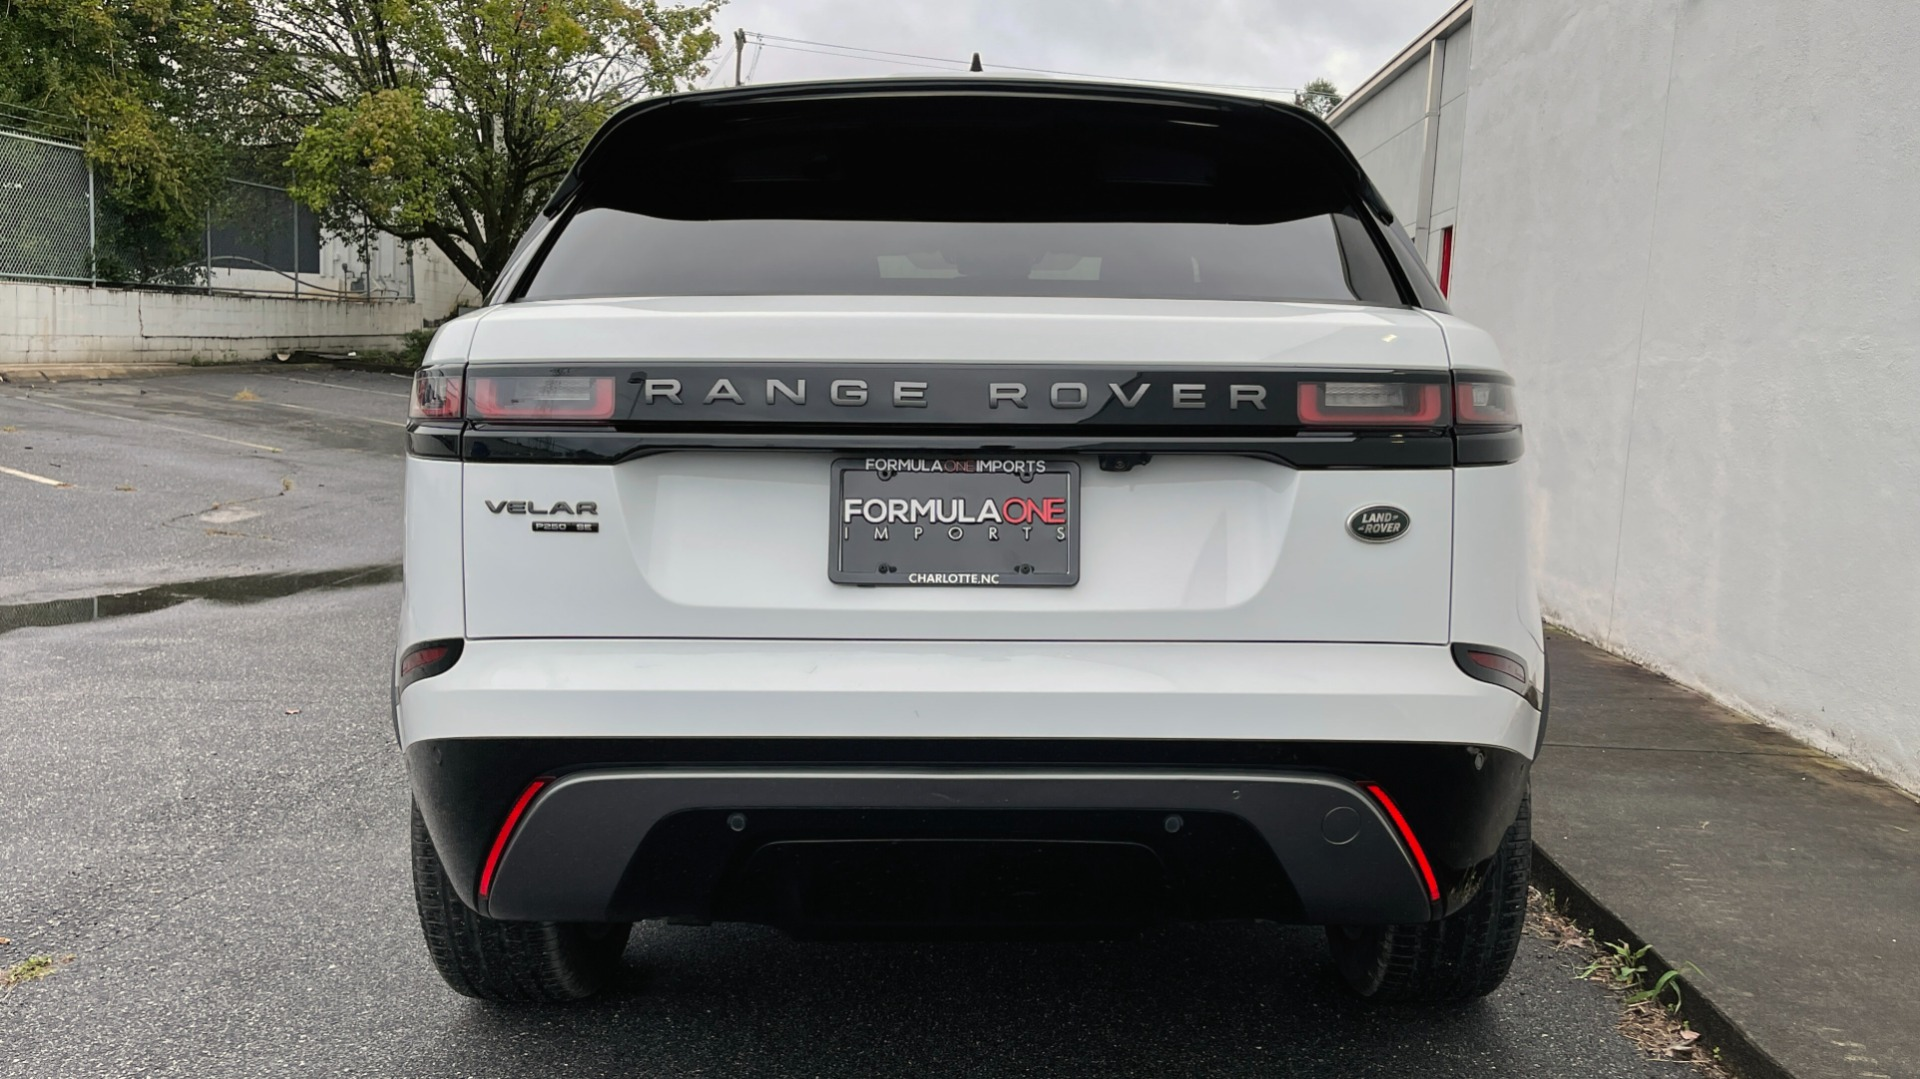 Used 2018 Land Rover RANGE ROVER VELAR R-DYNAMIC SE / NAV / PREM / MERIDIAN / SUNROOF / REARVIEW for sale $54,995 at Formula Imports in Charlotte NC 28227 16